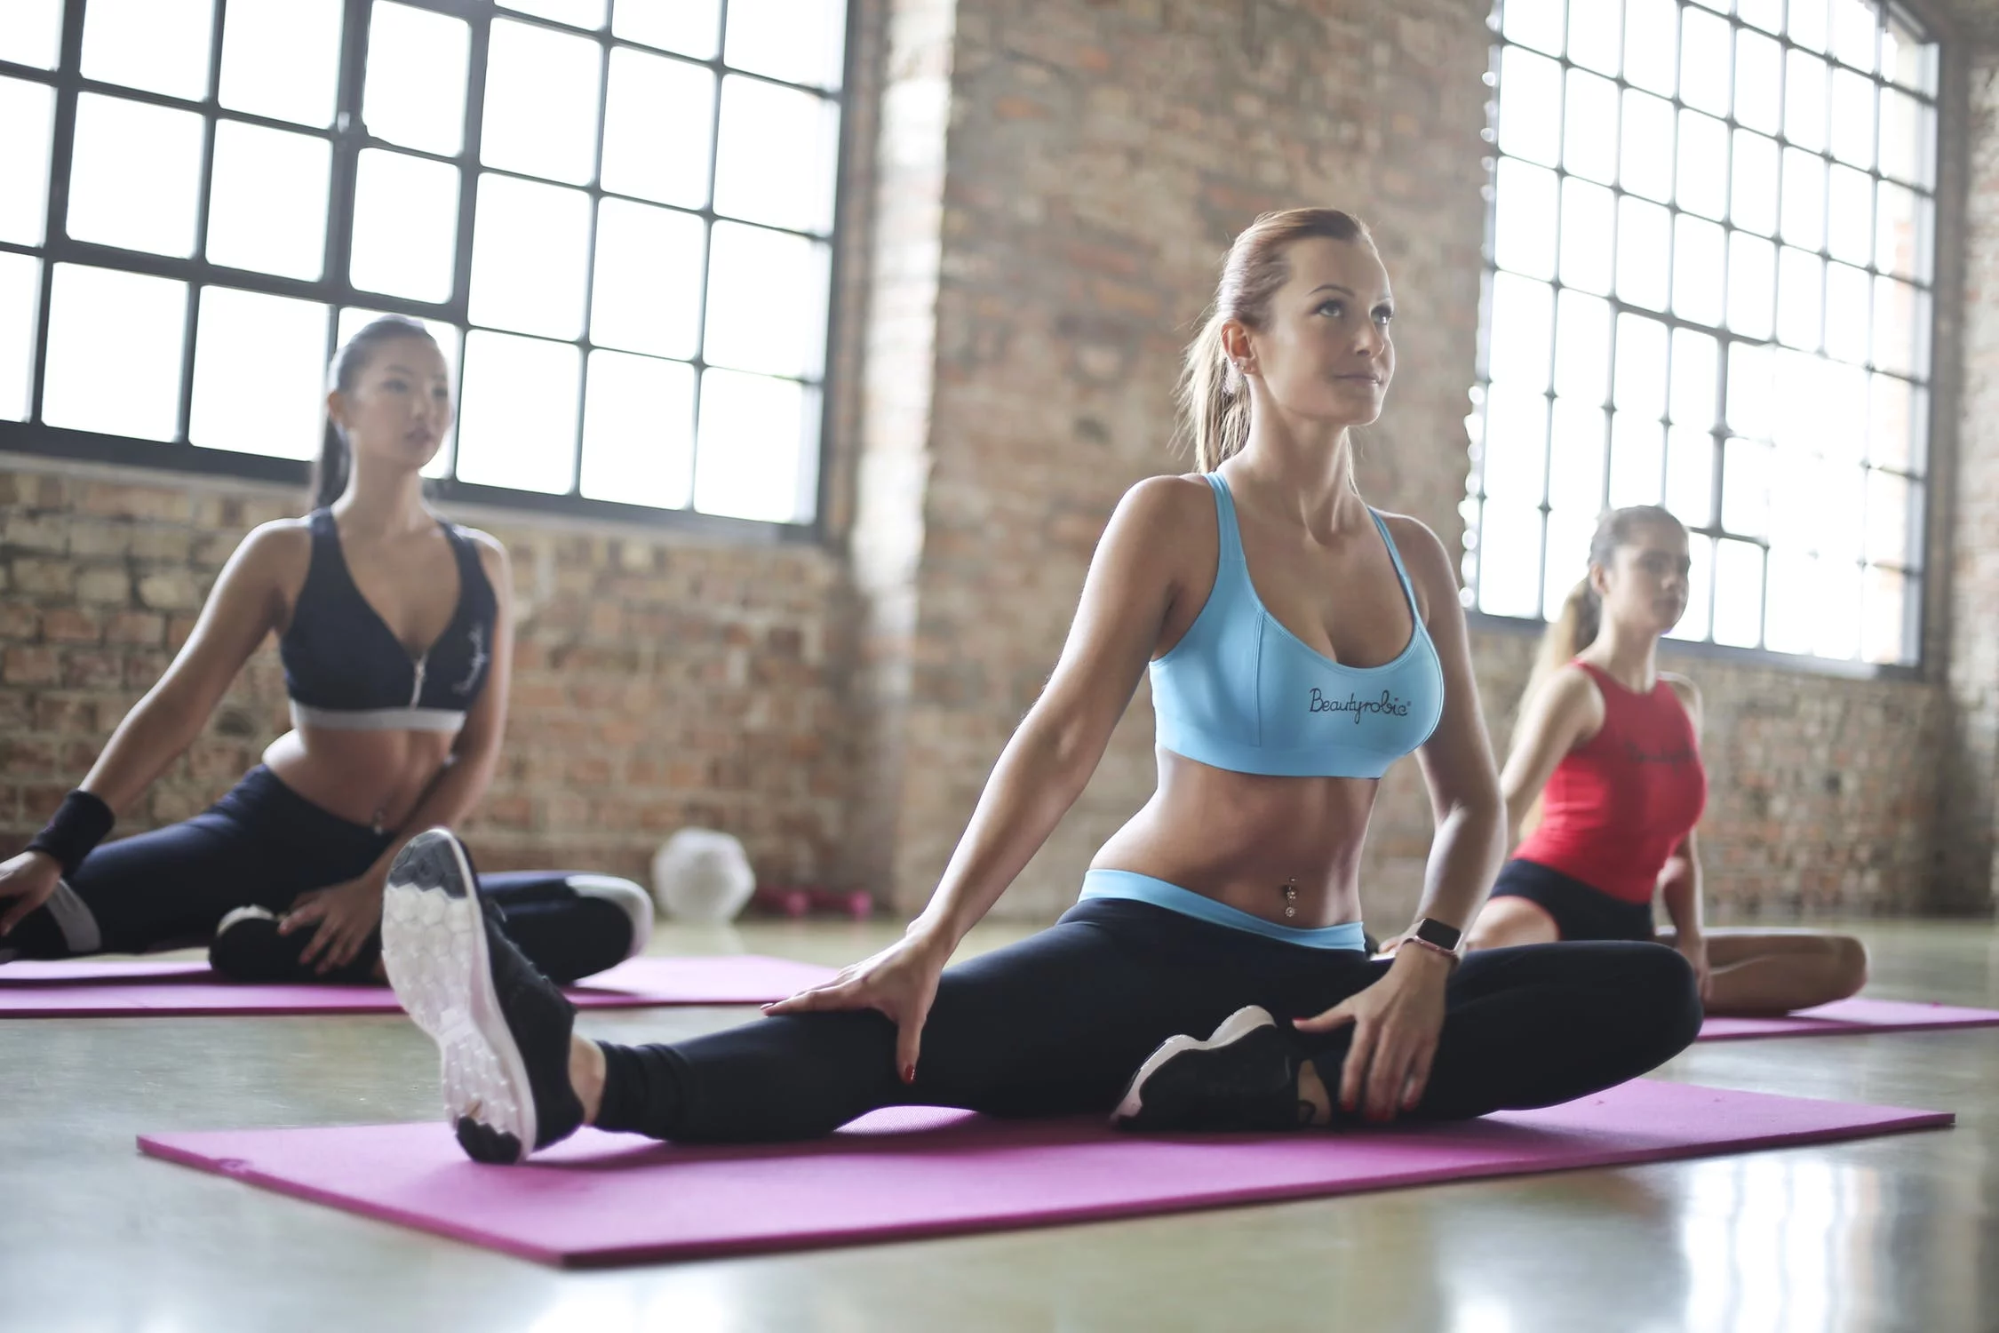 A balanced lifestyle equals overall wellness